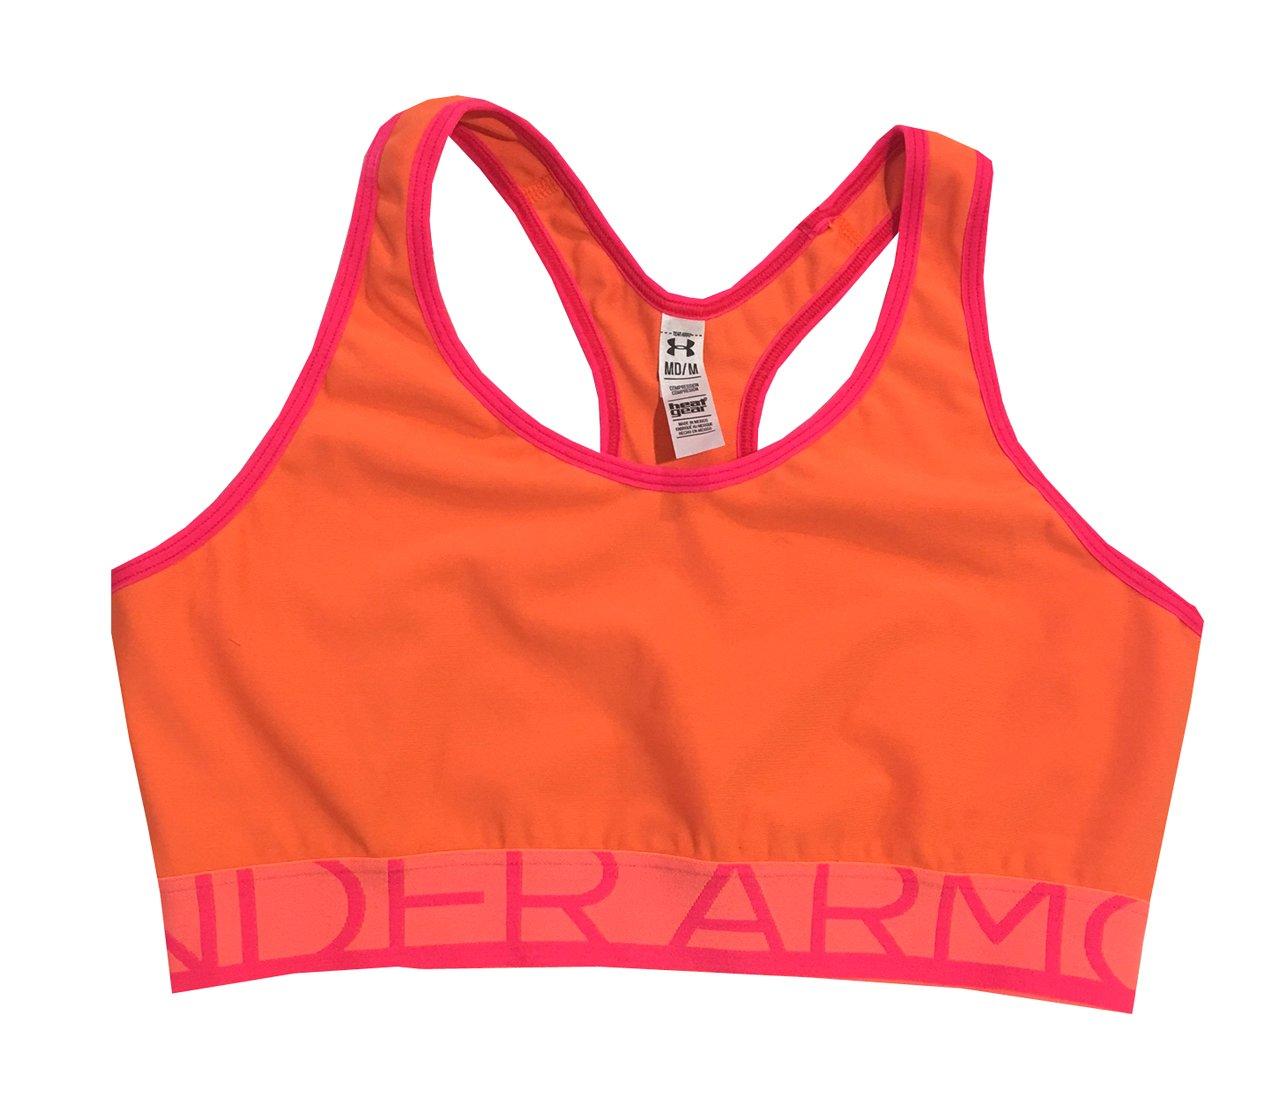 Under Armour Women's UA Still Gotta Have It Sports Bra (Medium, Citrus Blast (800))